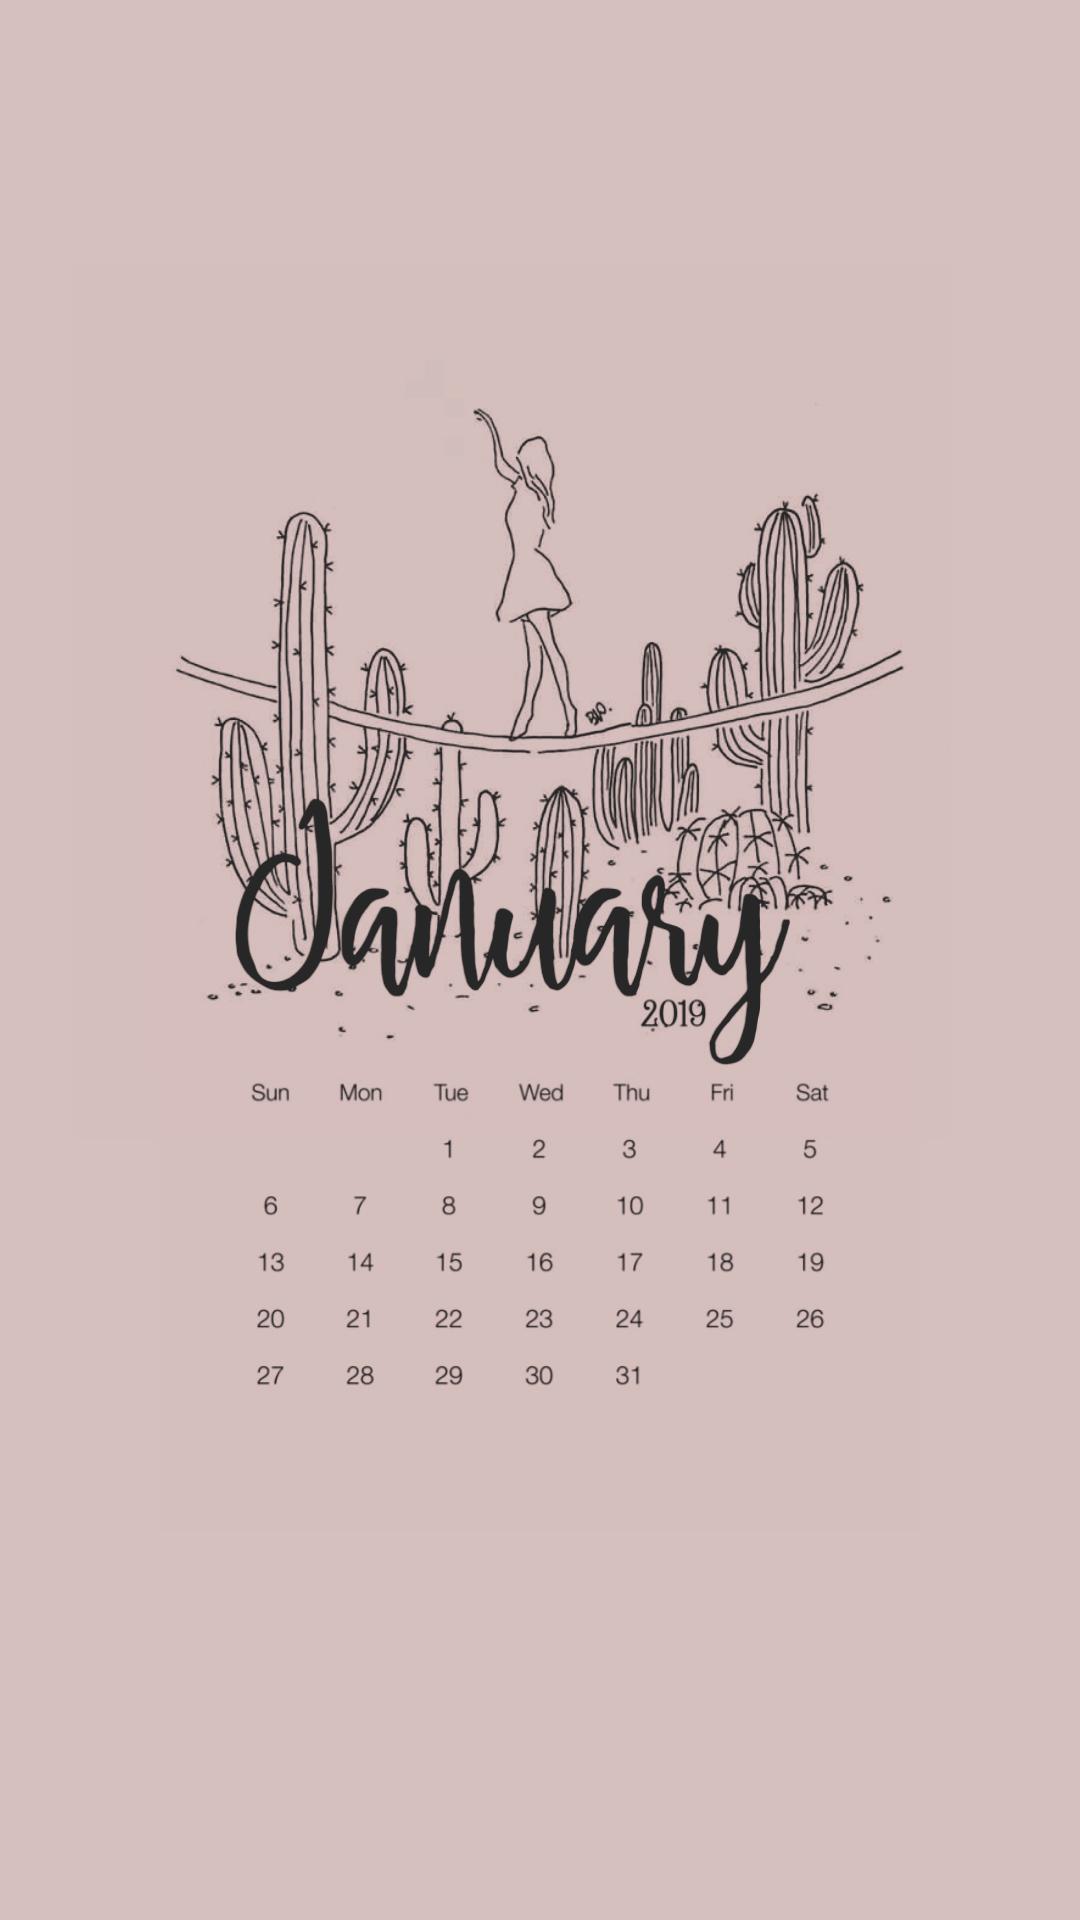 calendar wallpaper Tumblr 1080x1920